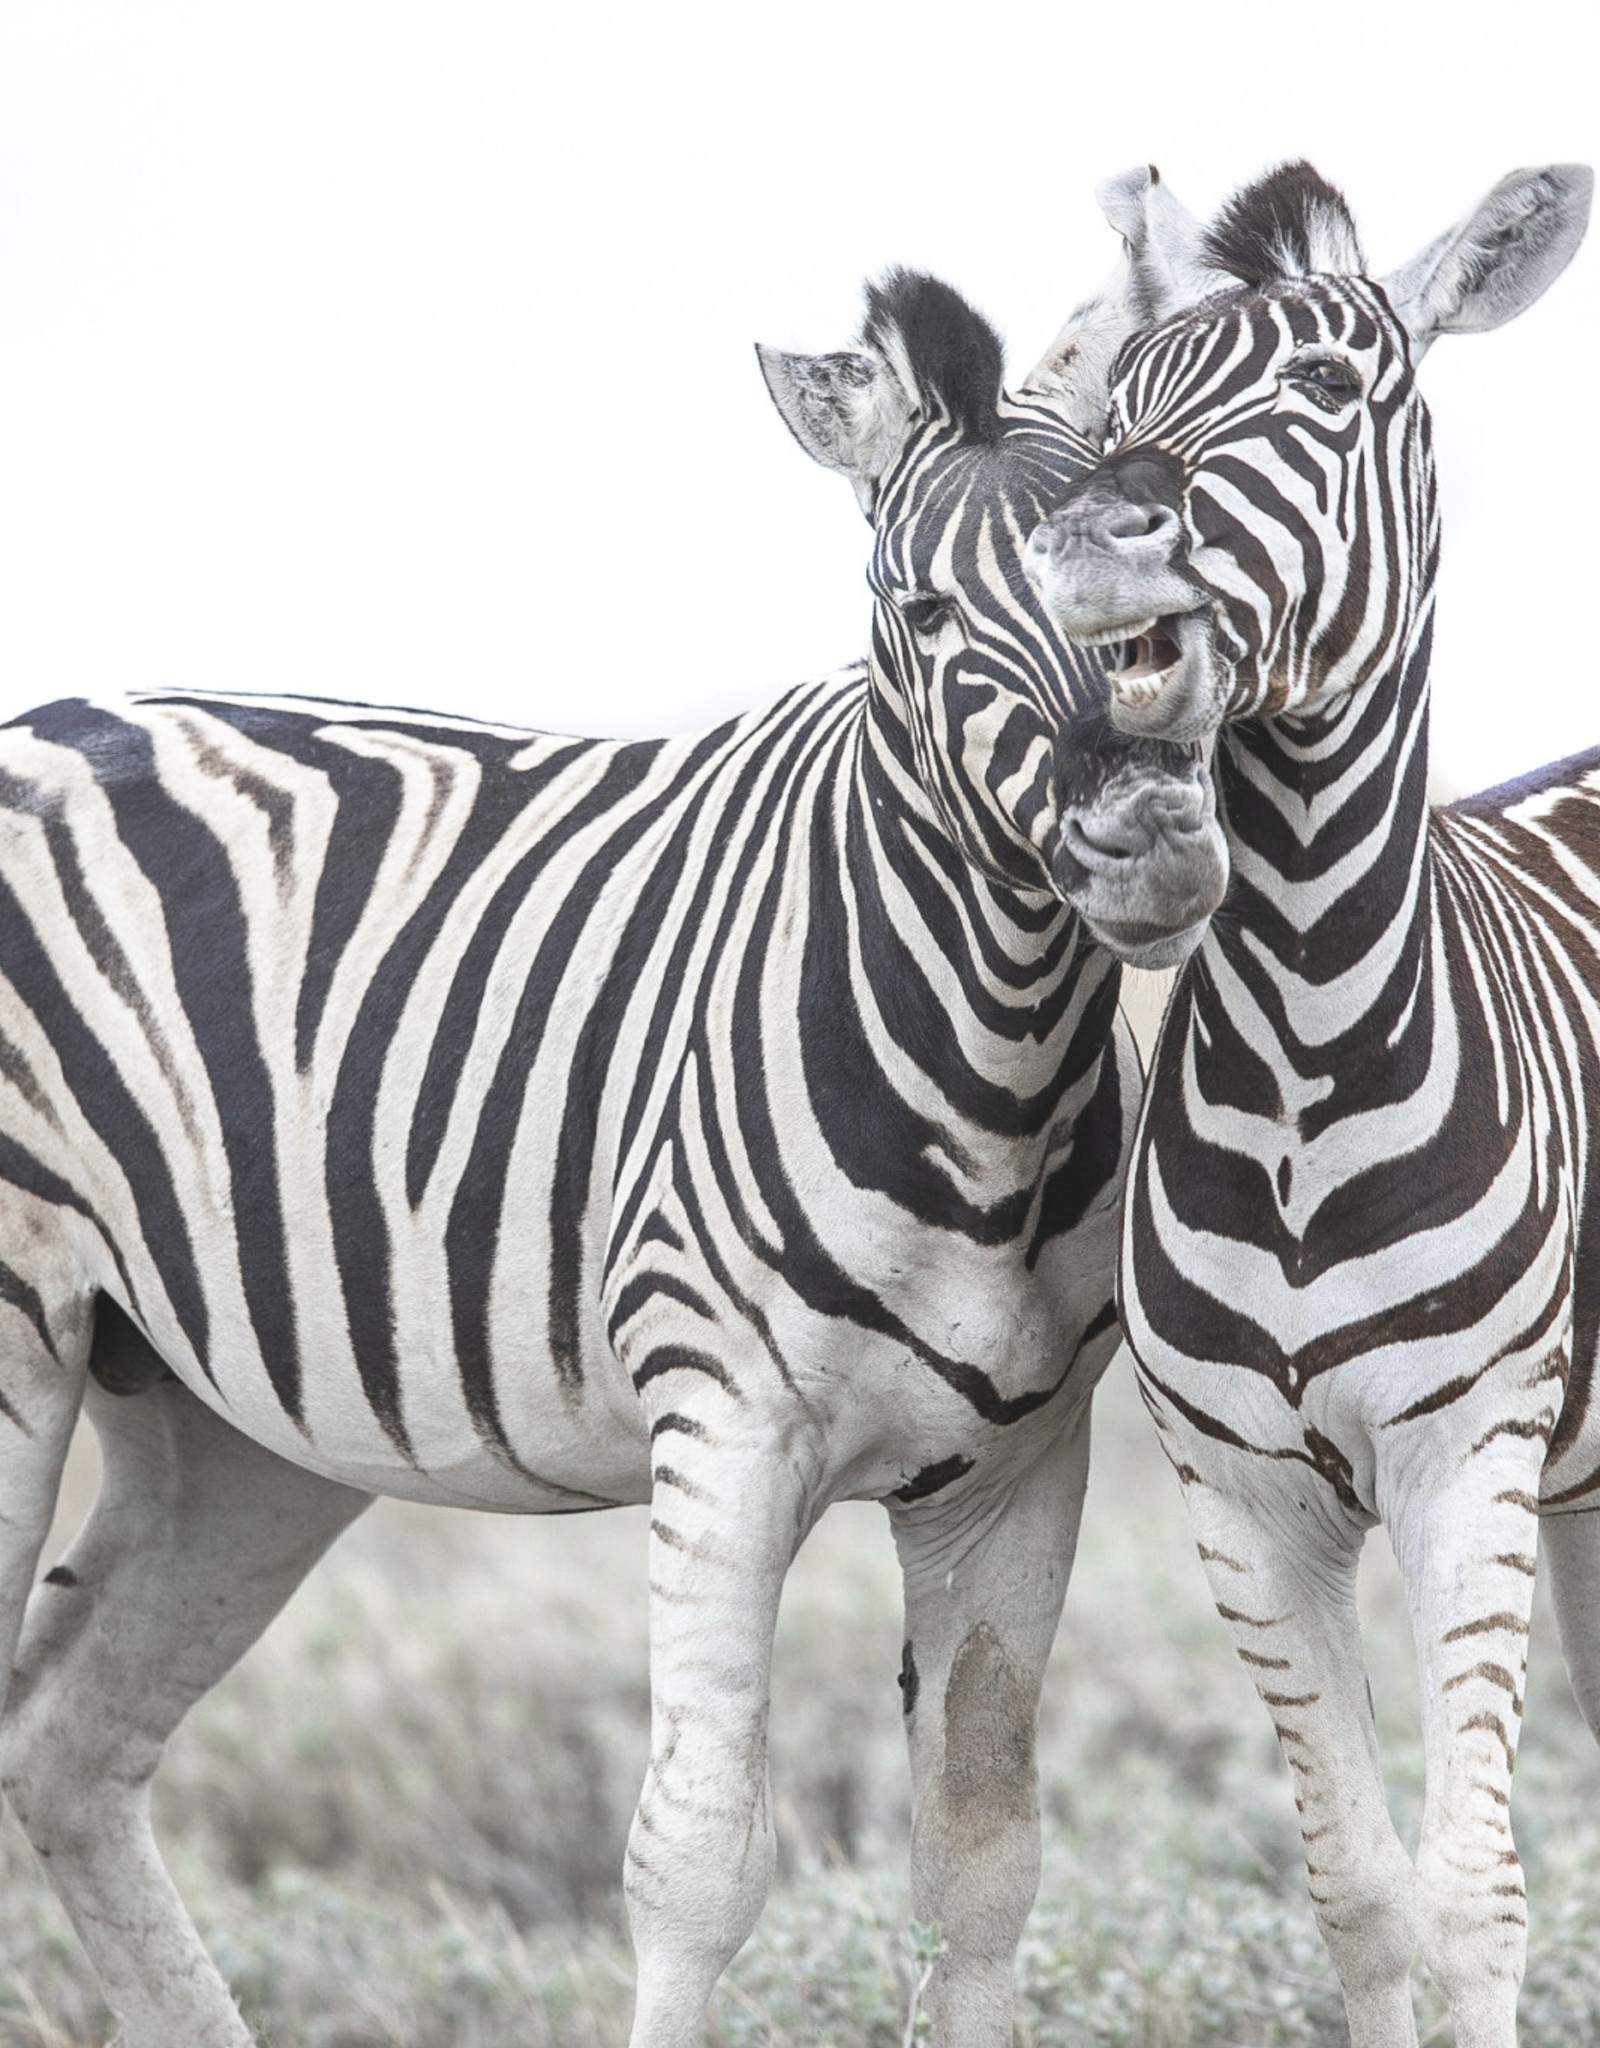 Alicia Hill Playful Zebras